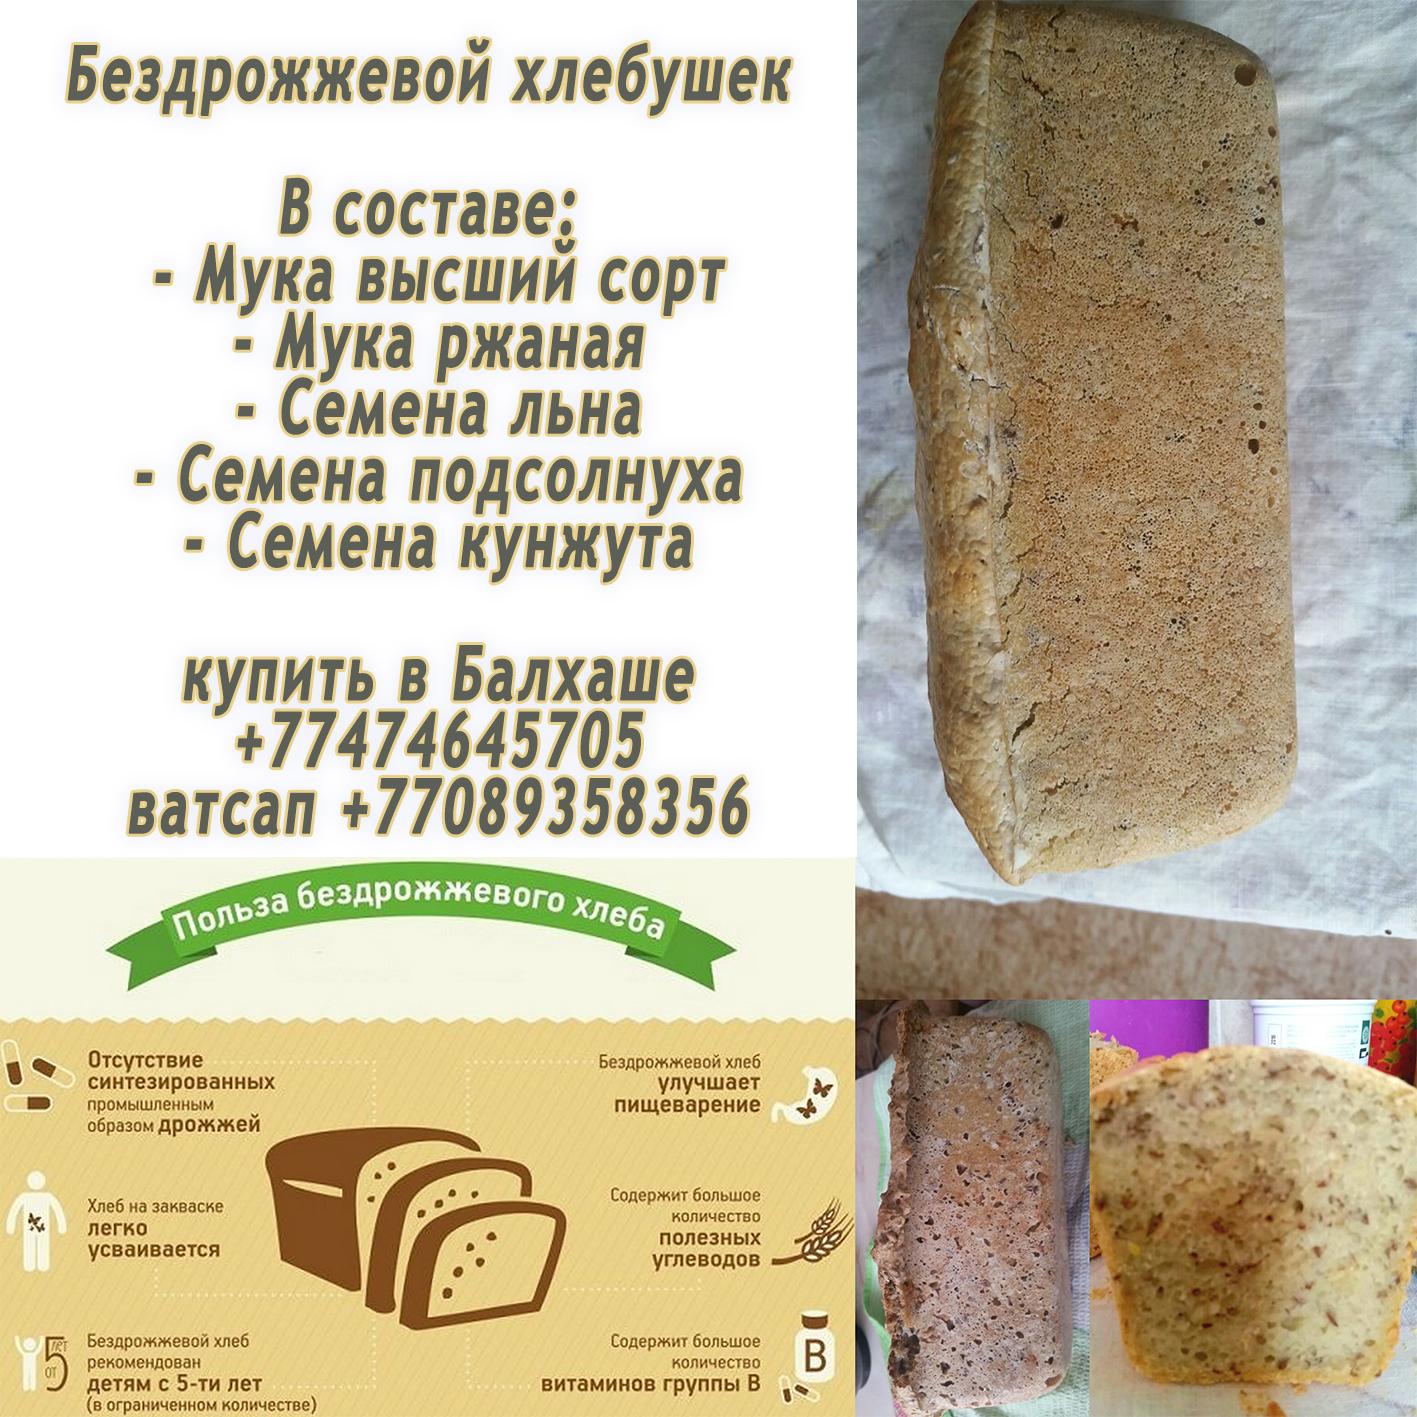 Рецепт хлеба ржаного бездрожжевого хлеба в духовке в домашних условиях